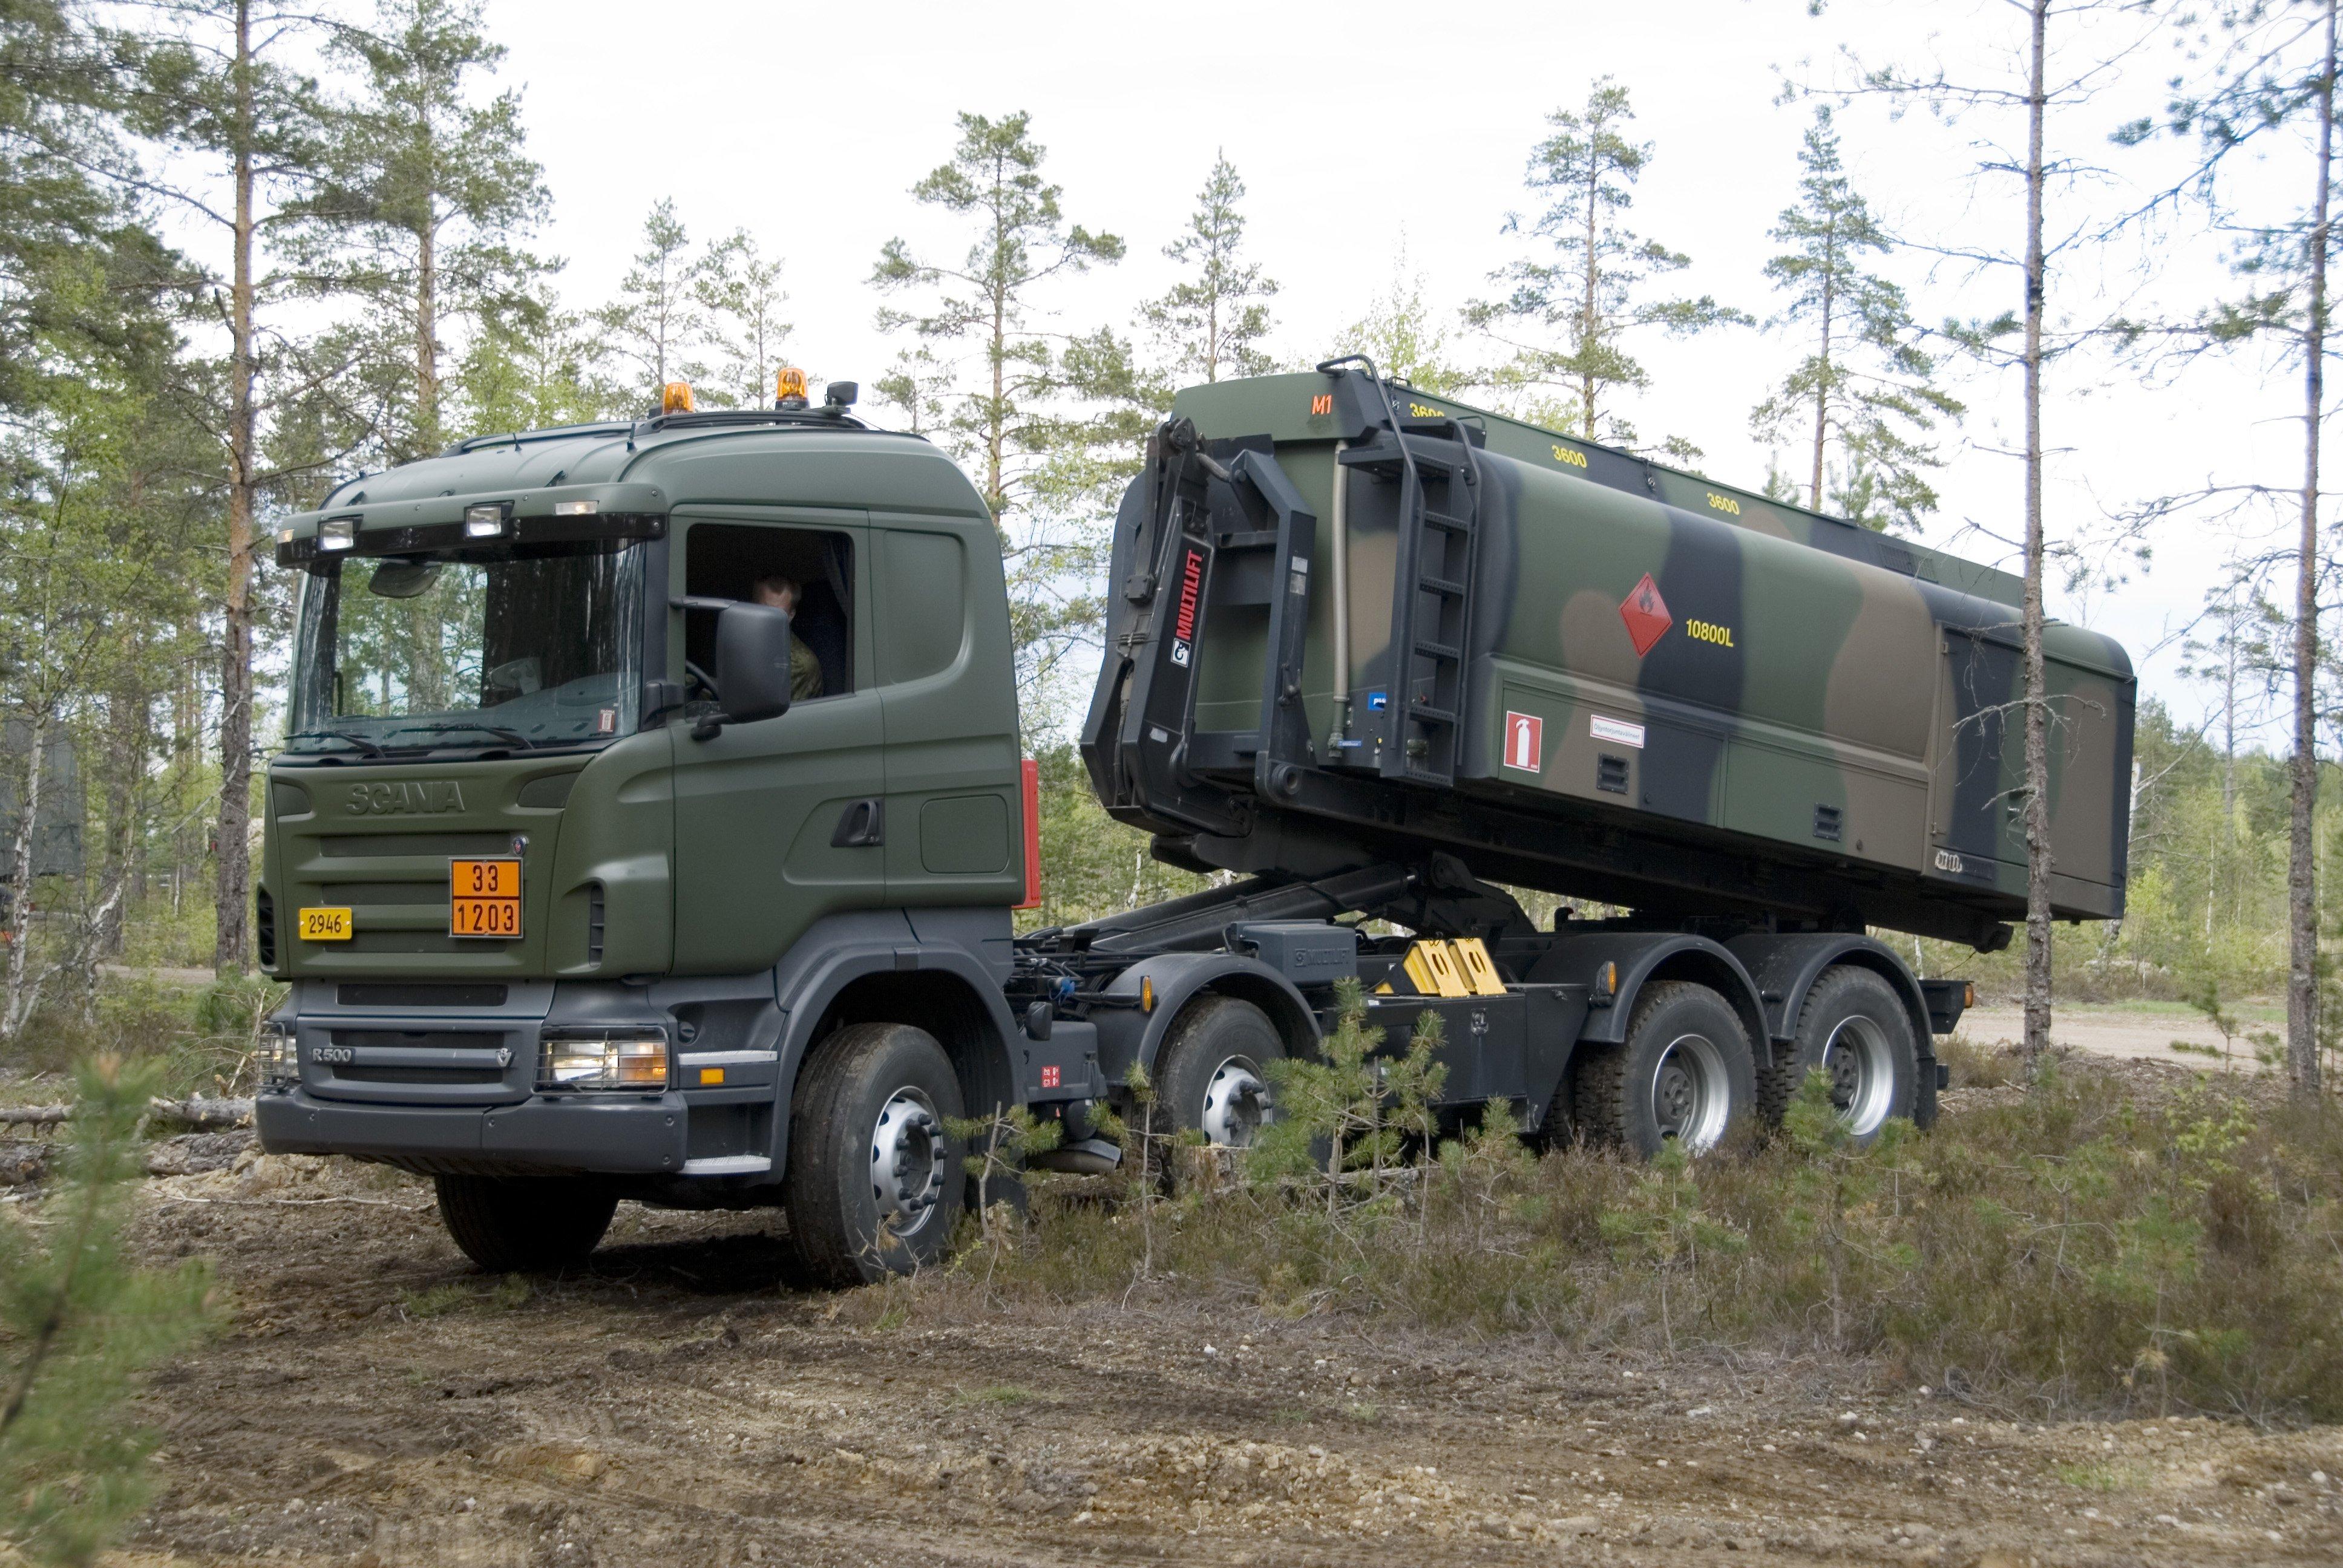 2017 Trucks >> 2007 Scania R500 8x4 H-Z military semi tractor wallpaper | 3872x2592 | 845394 | WallpaperUP